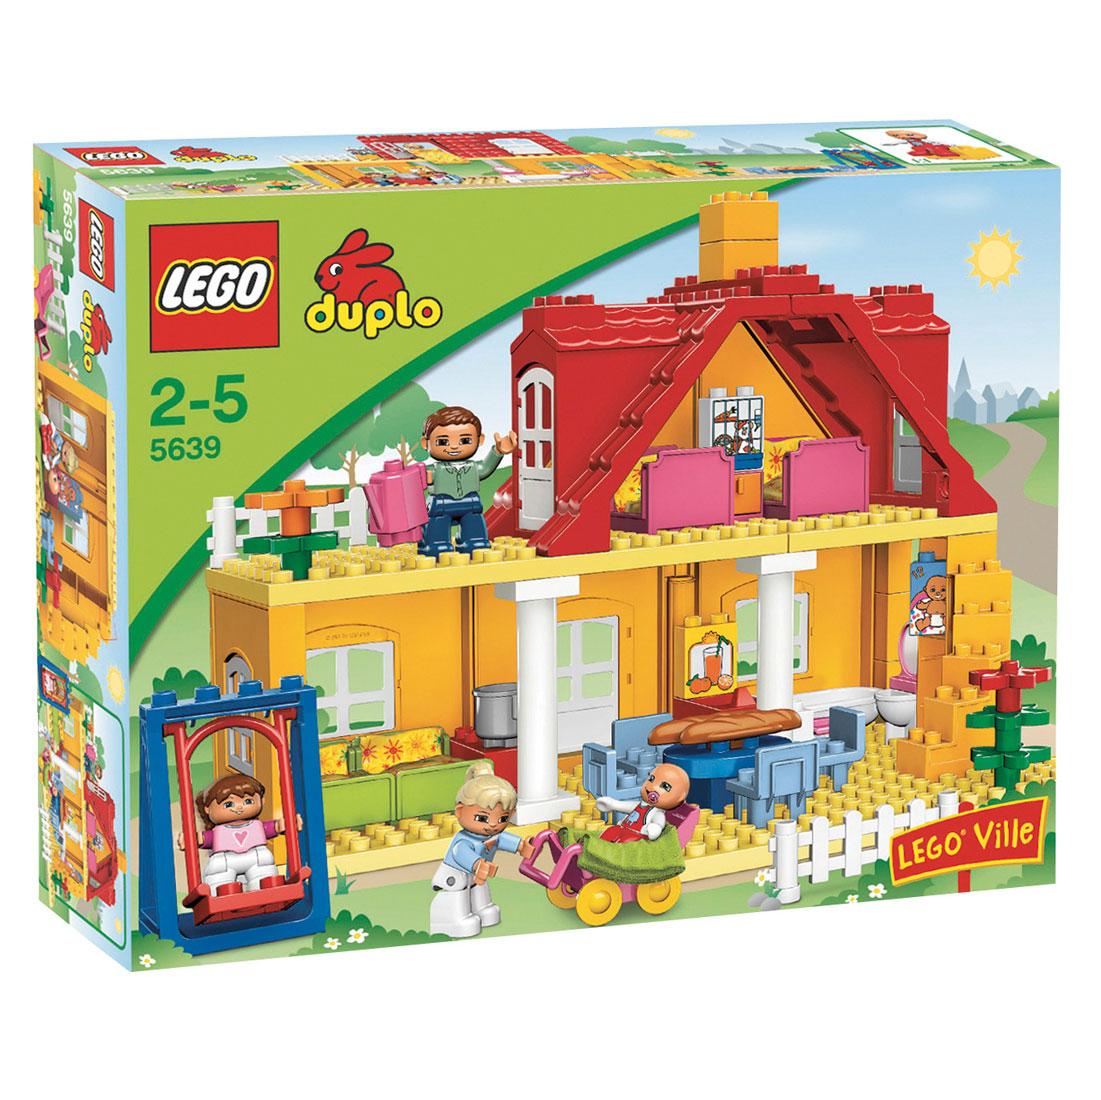 LEGO DUPLO LEGOville 5639 Familiehuis online kopen | Lobbes.nl